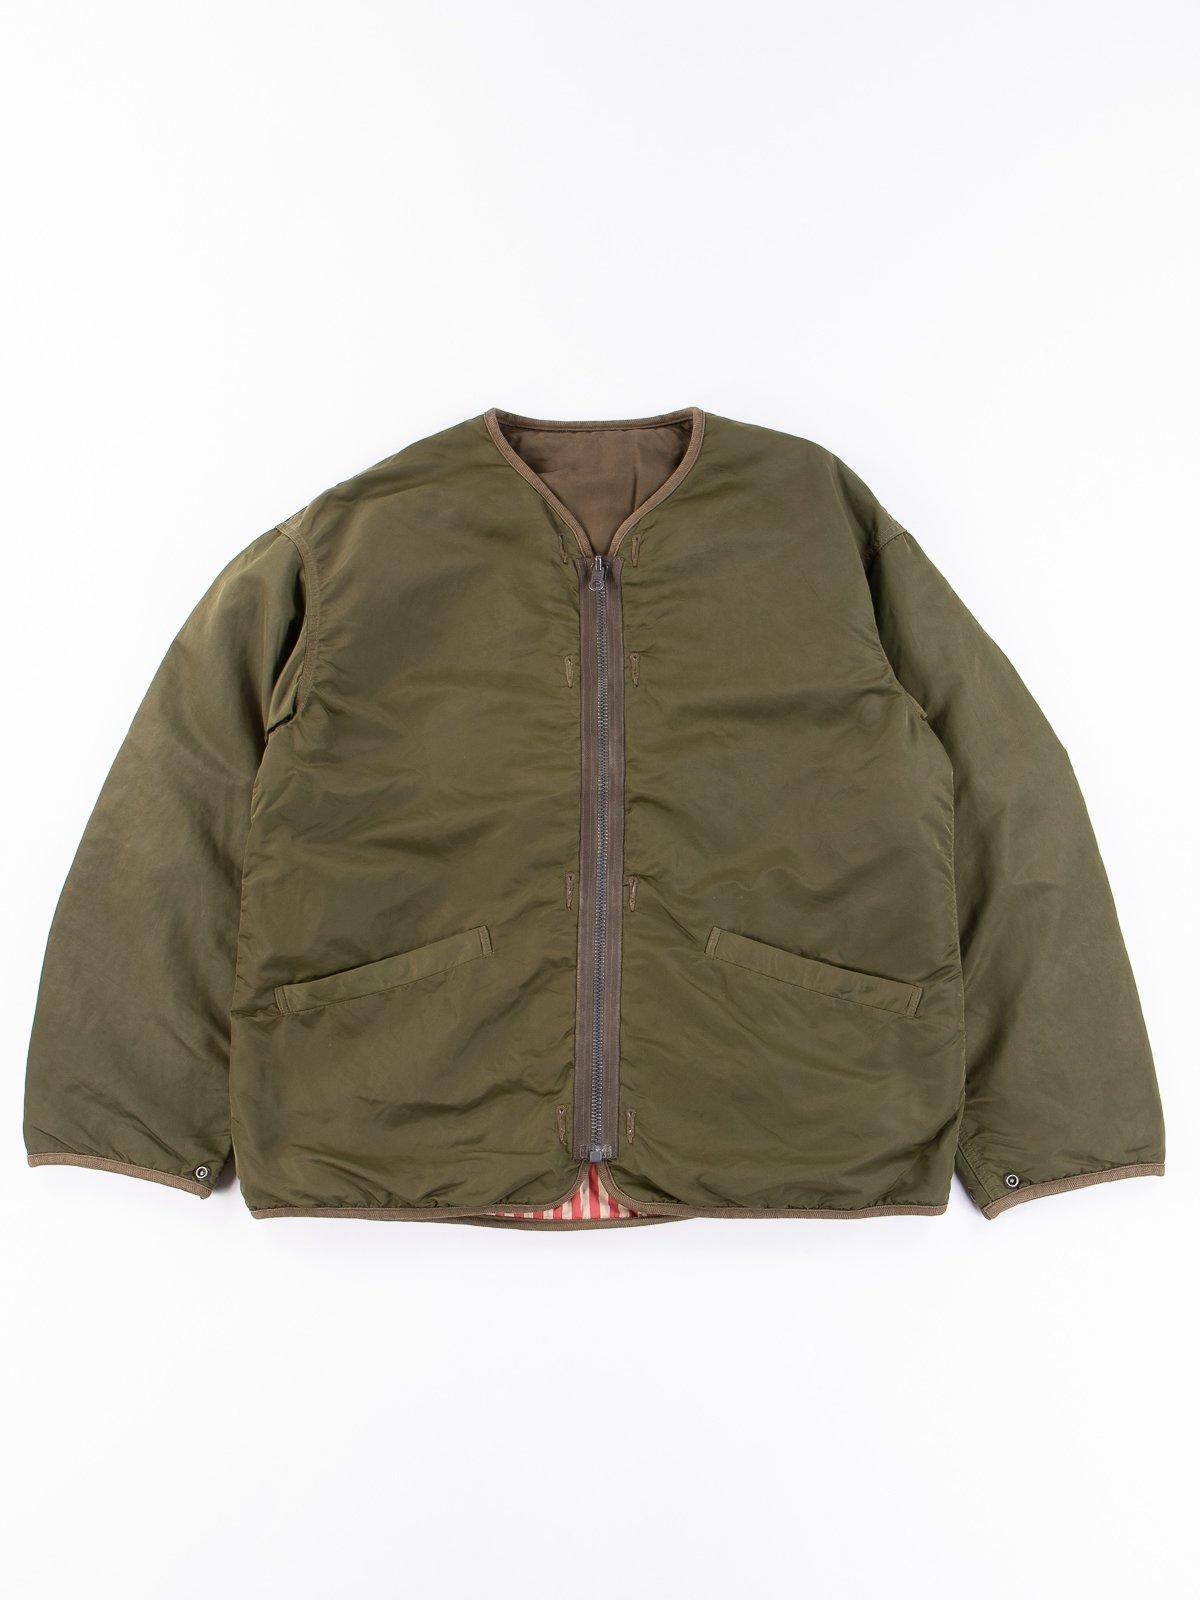 Olive Iris Liner Jacket - Image 1